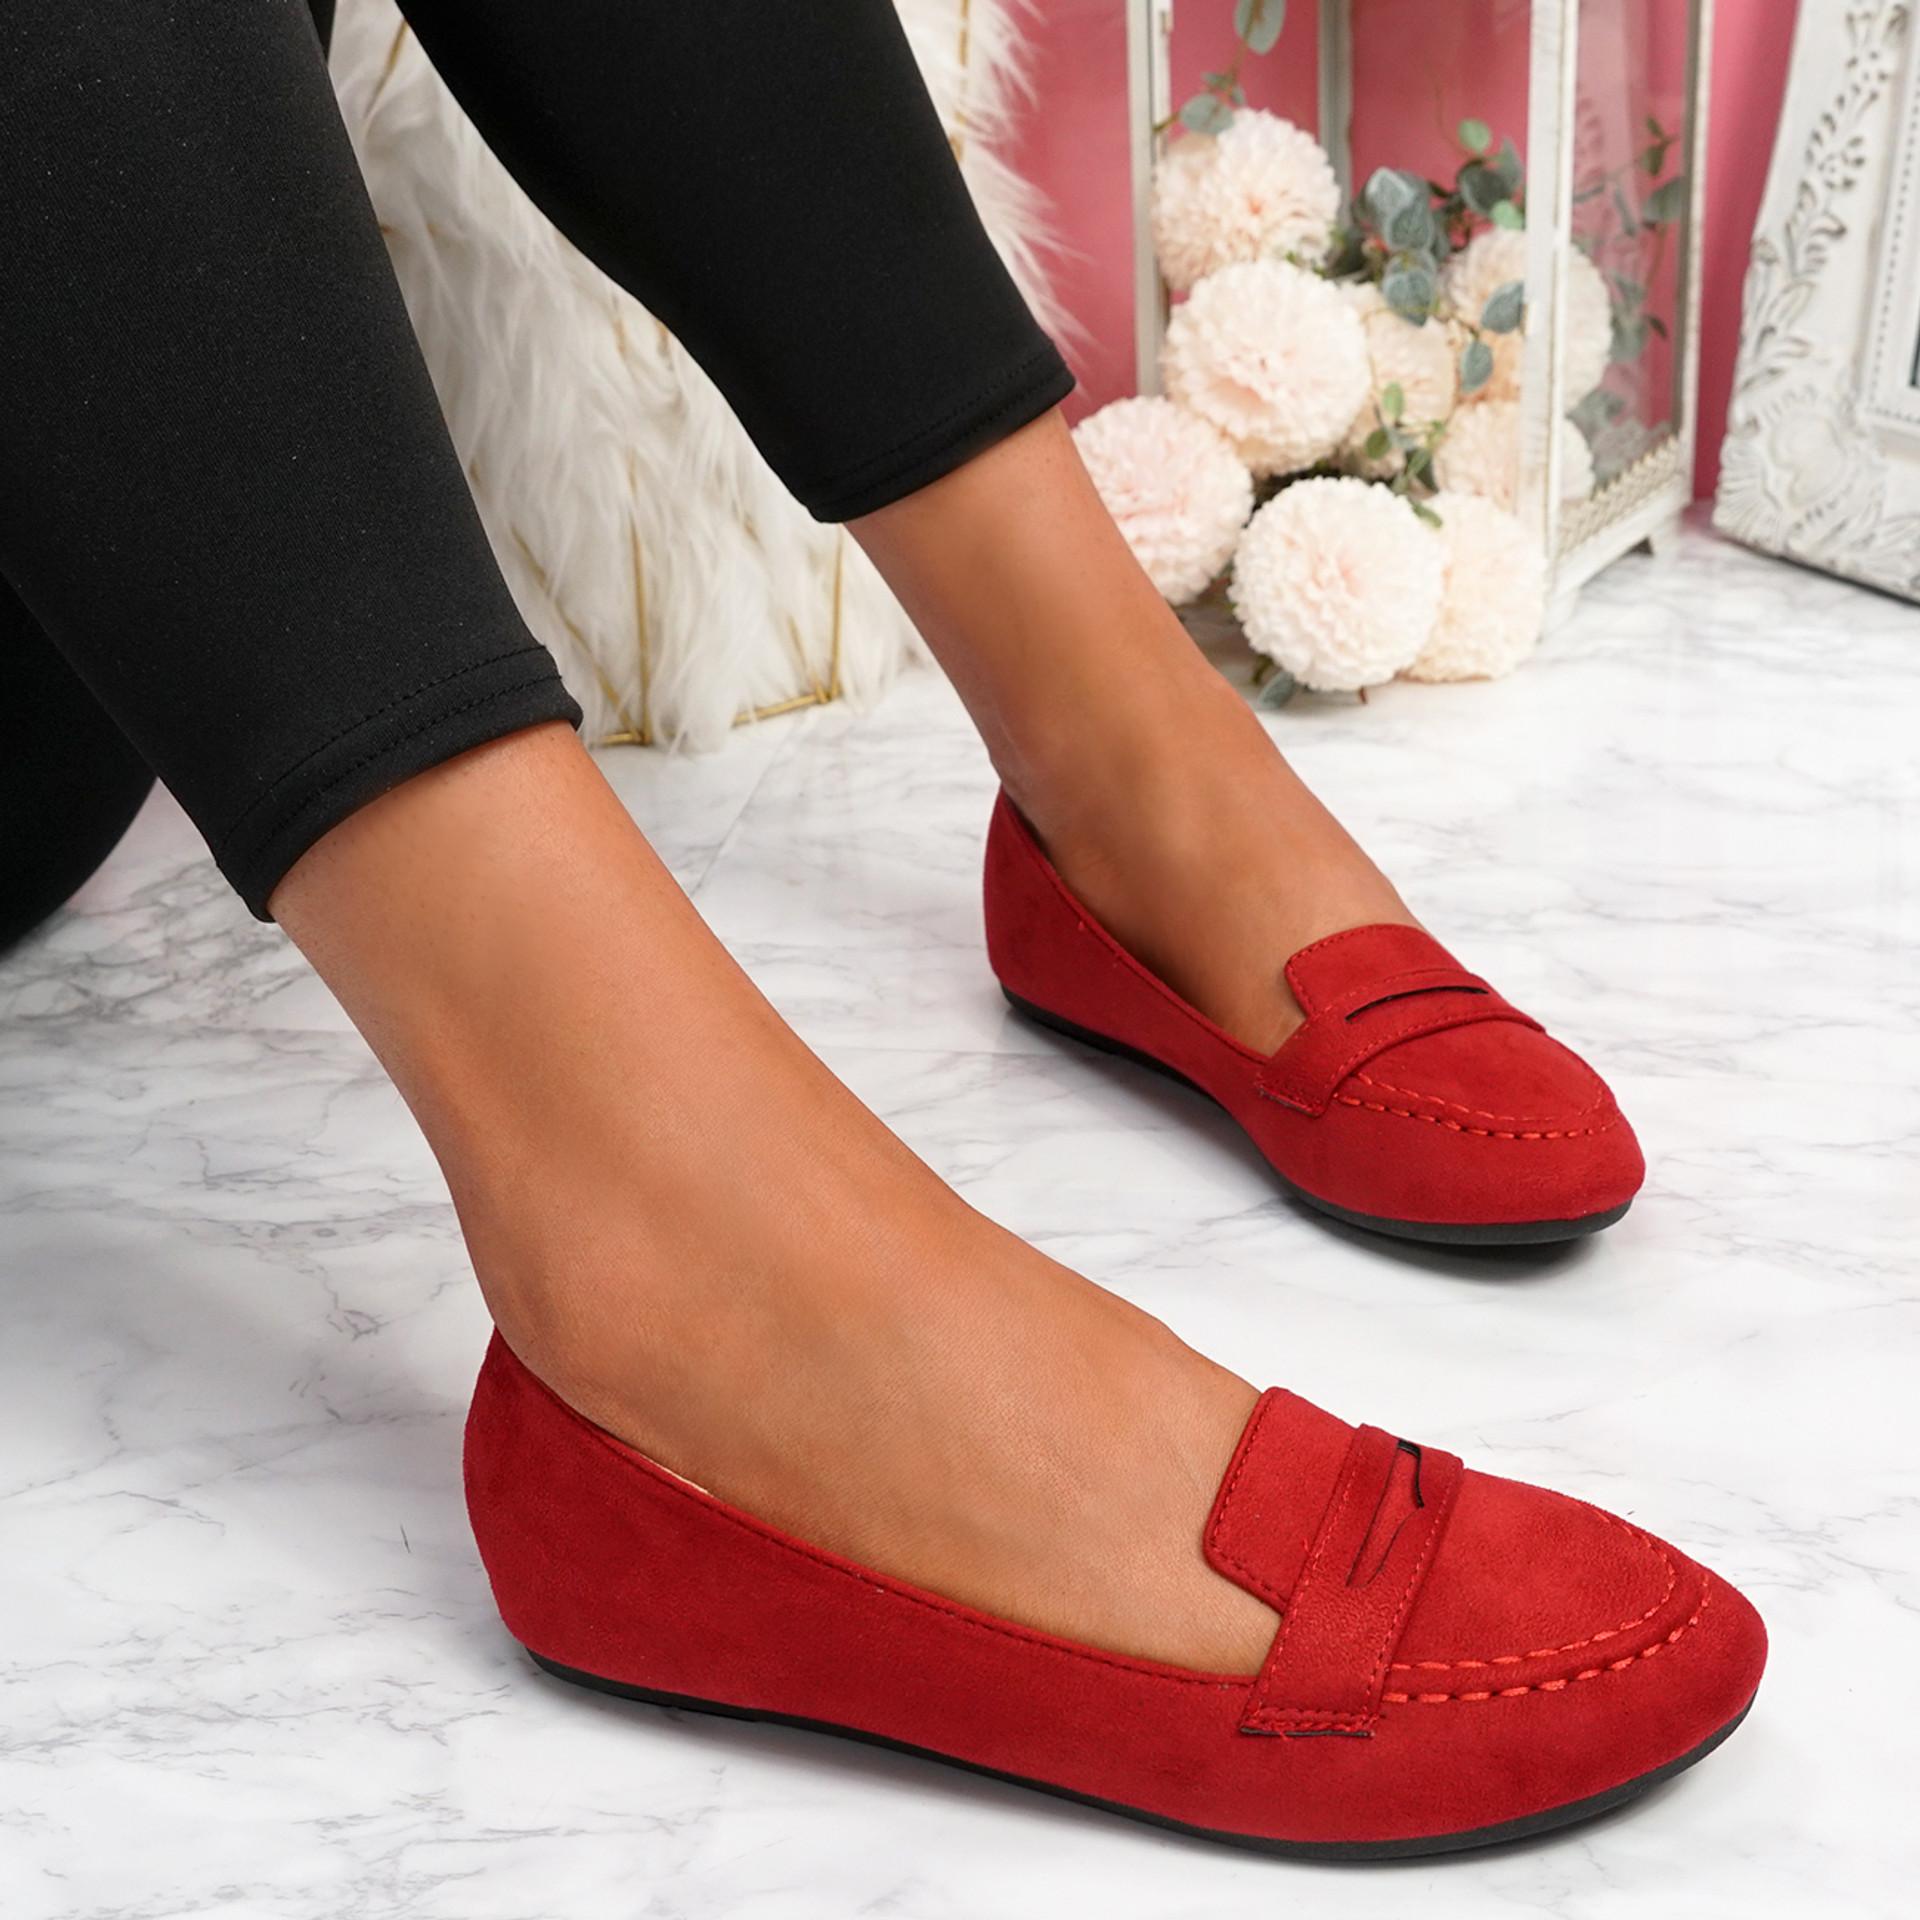 Oze Red Flat Ballerinas